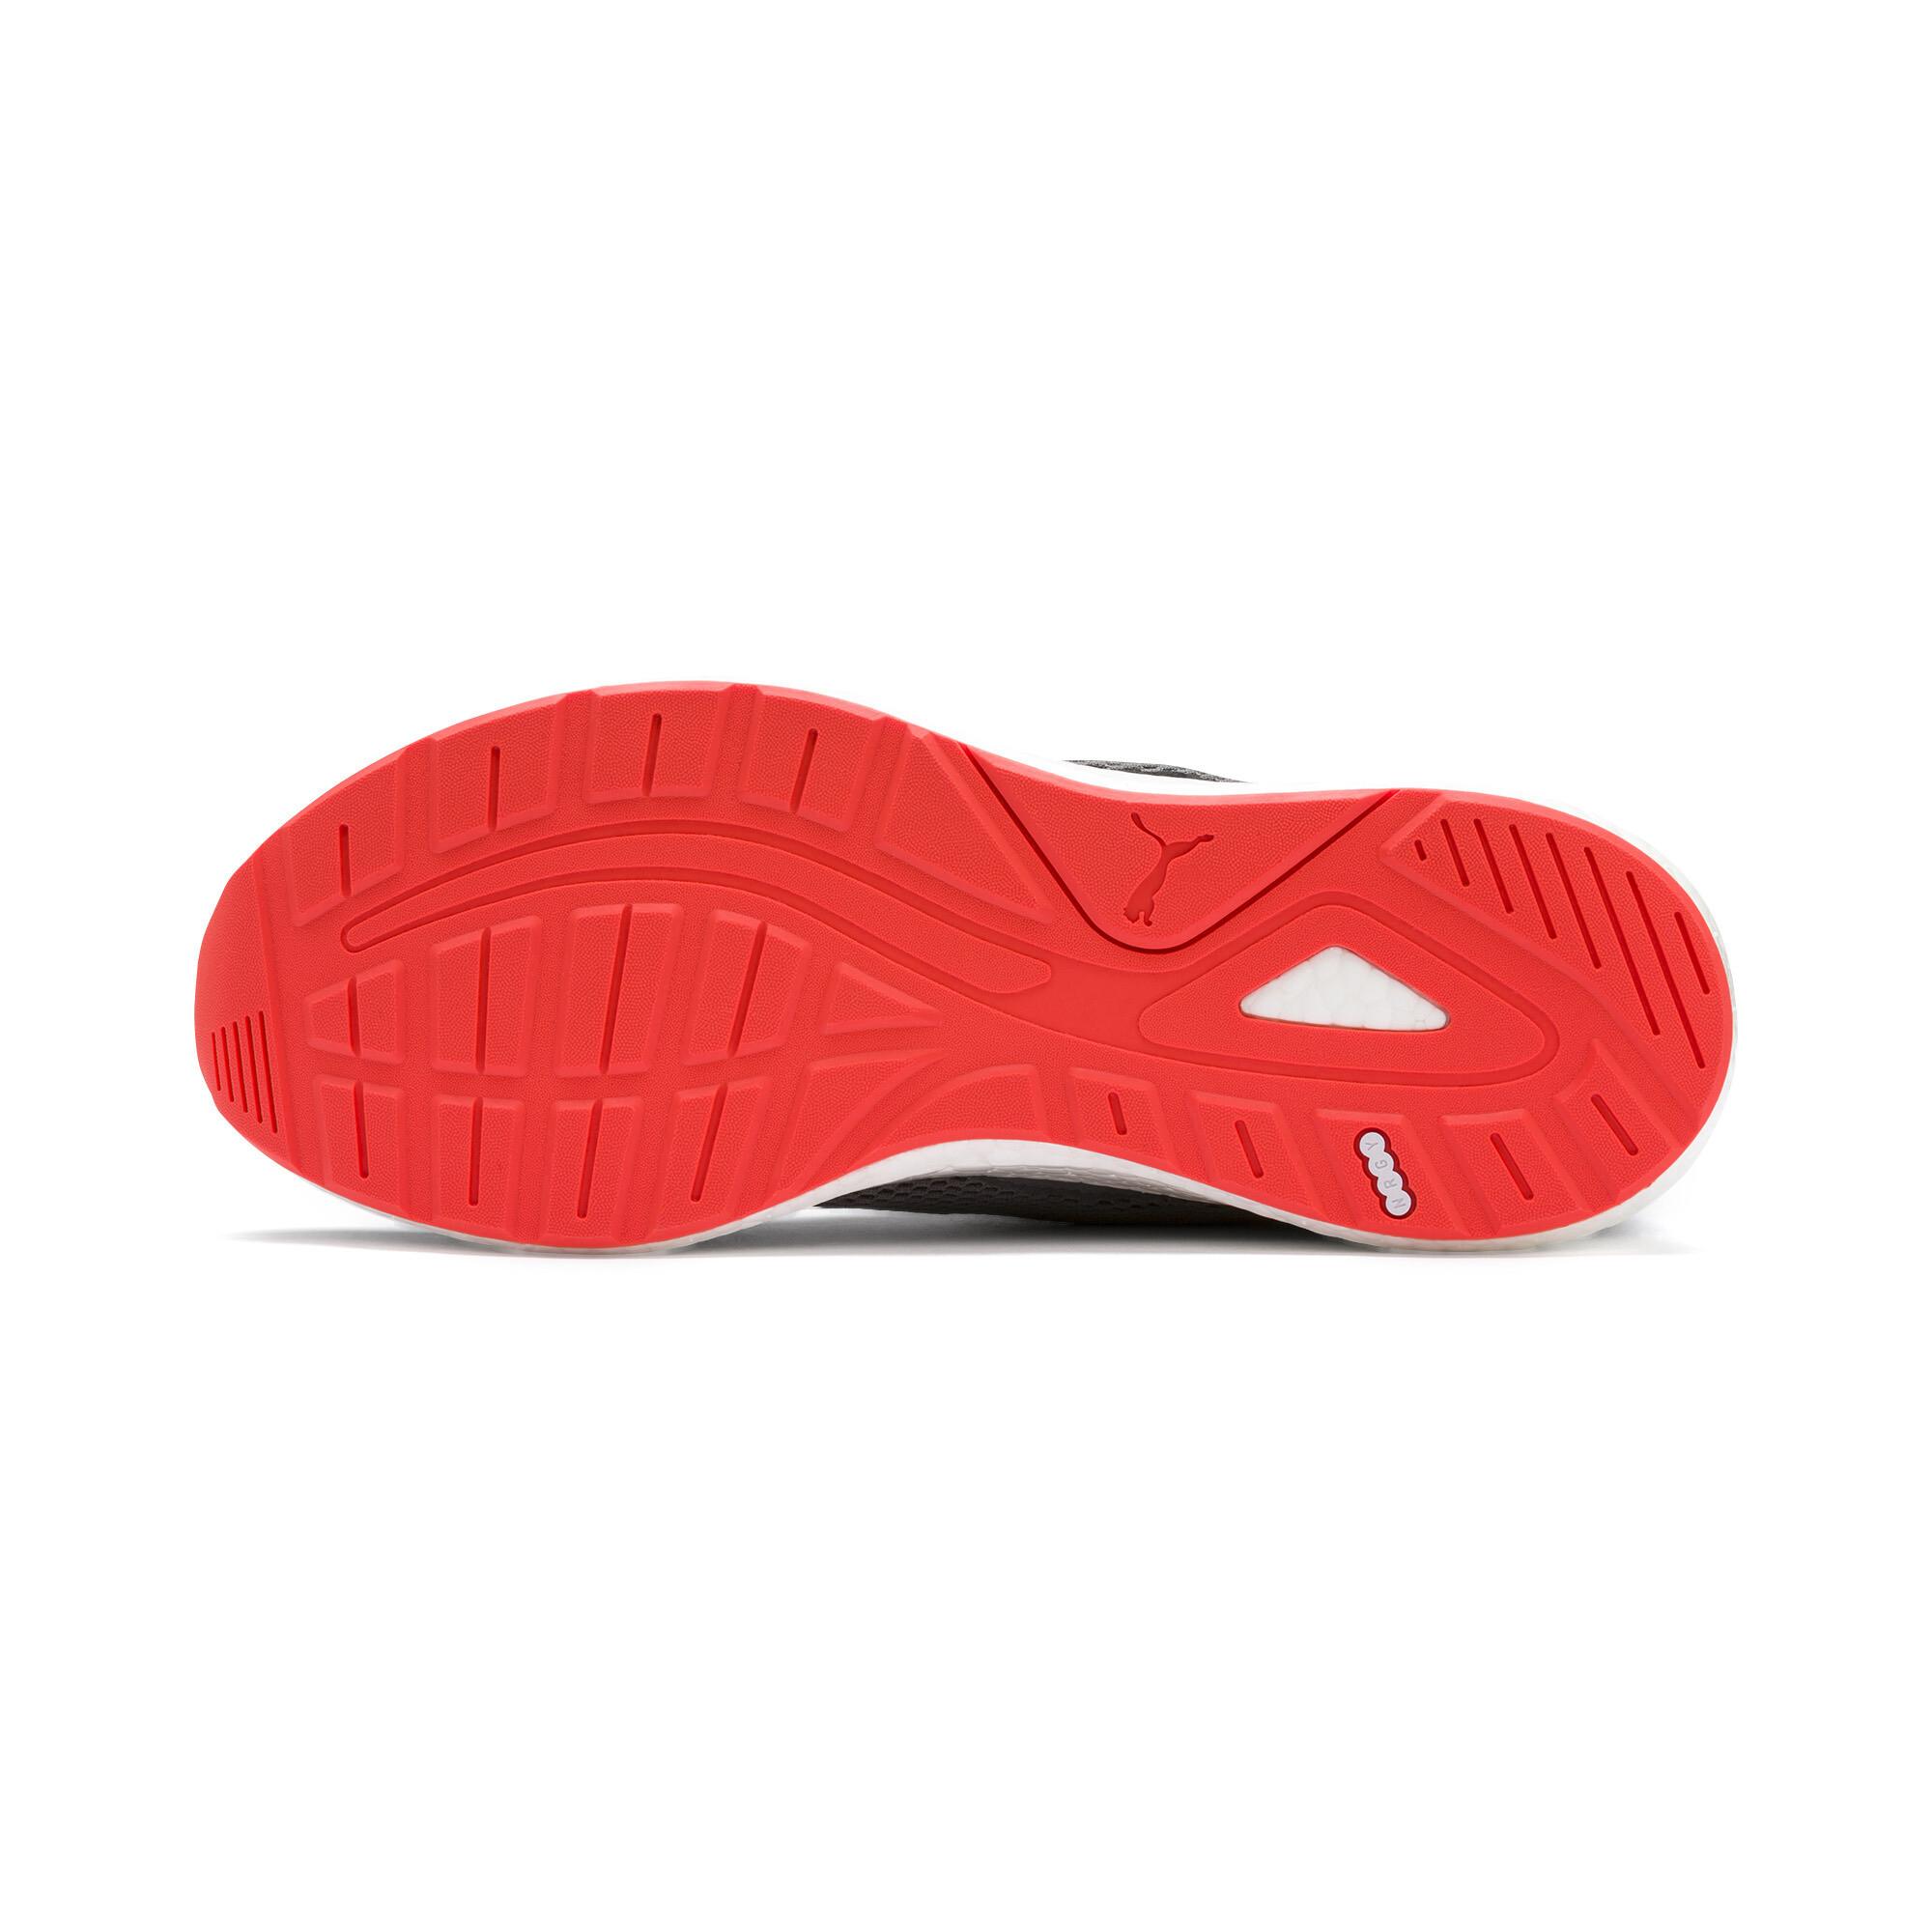 PUMA-NRGY-Neko-Skim-Men-s-Running-Shoes-Men-Shoe-Running thumbnail 11